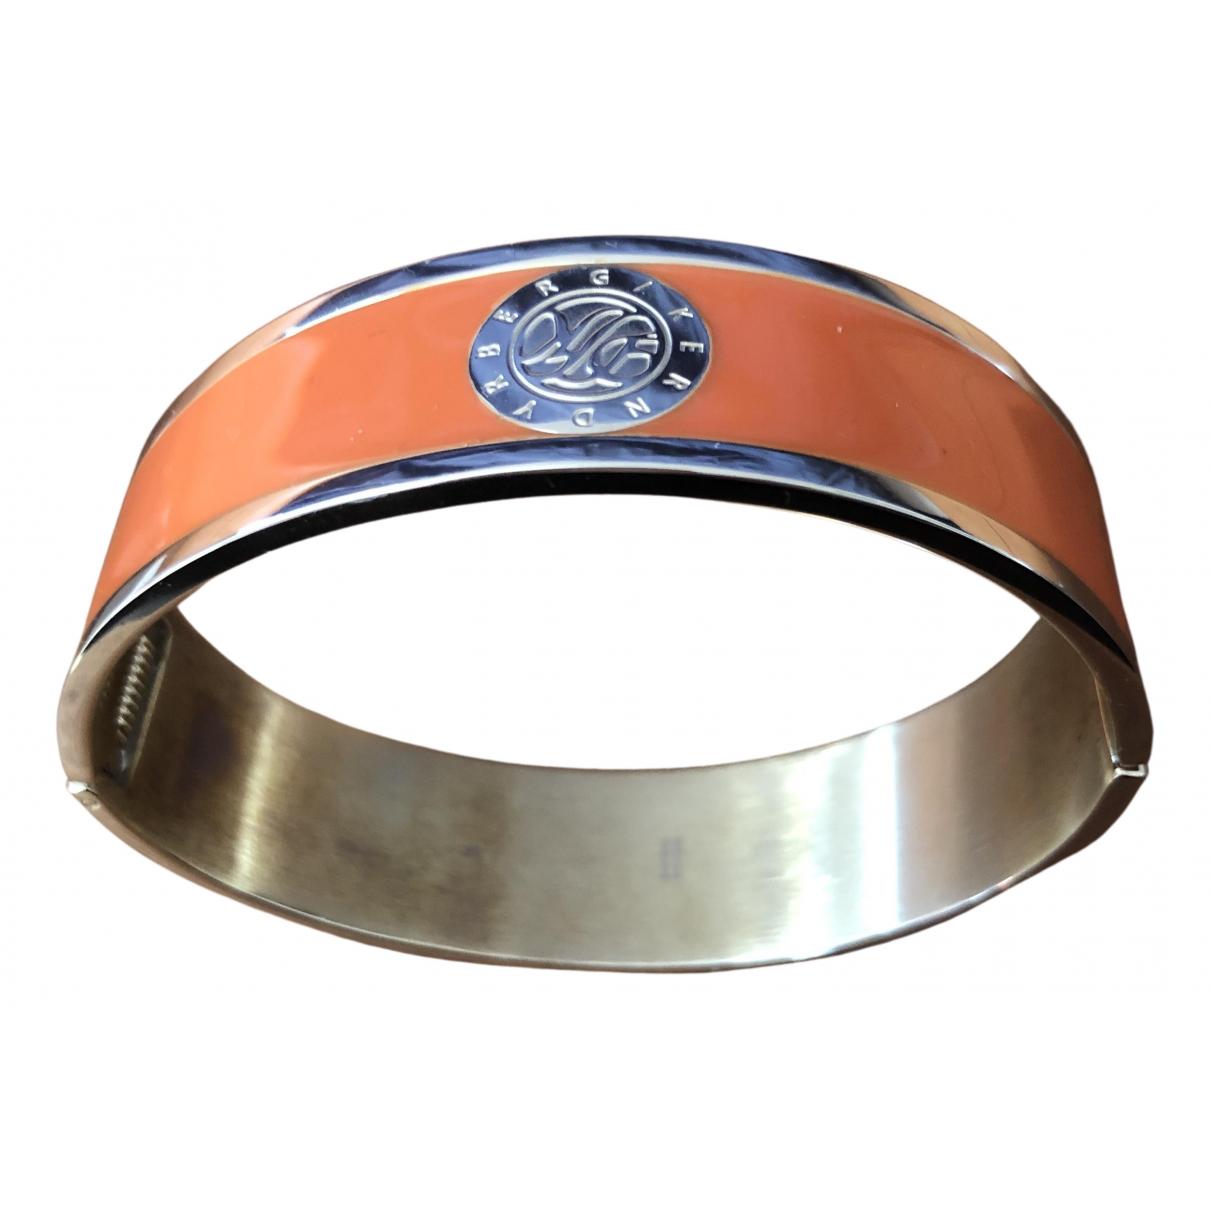 Dyrberg/kern \N Armband in  Orange Stahl